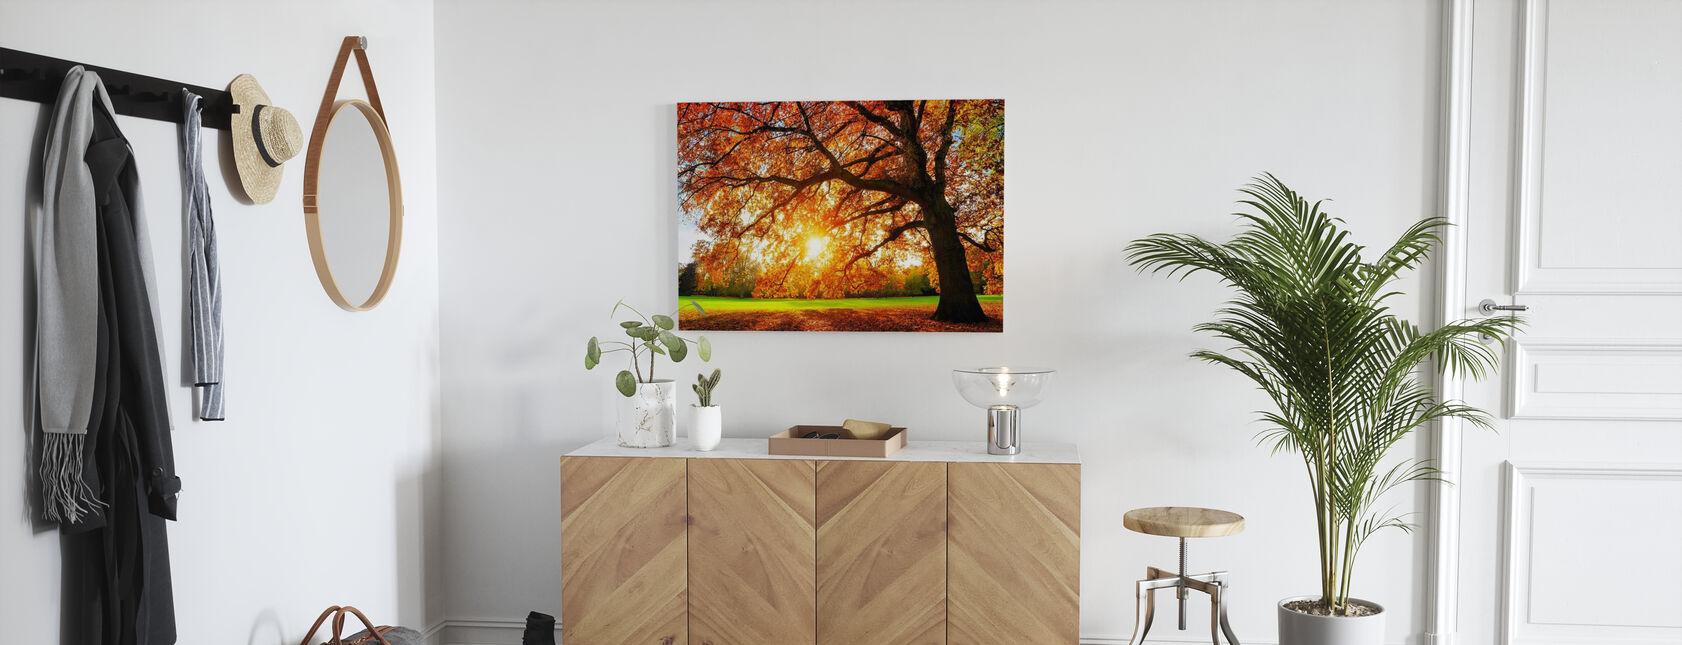 Majestic Oak Tree - Canvas print - Hallway